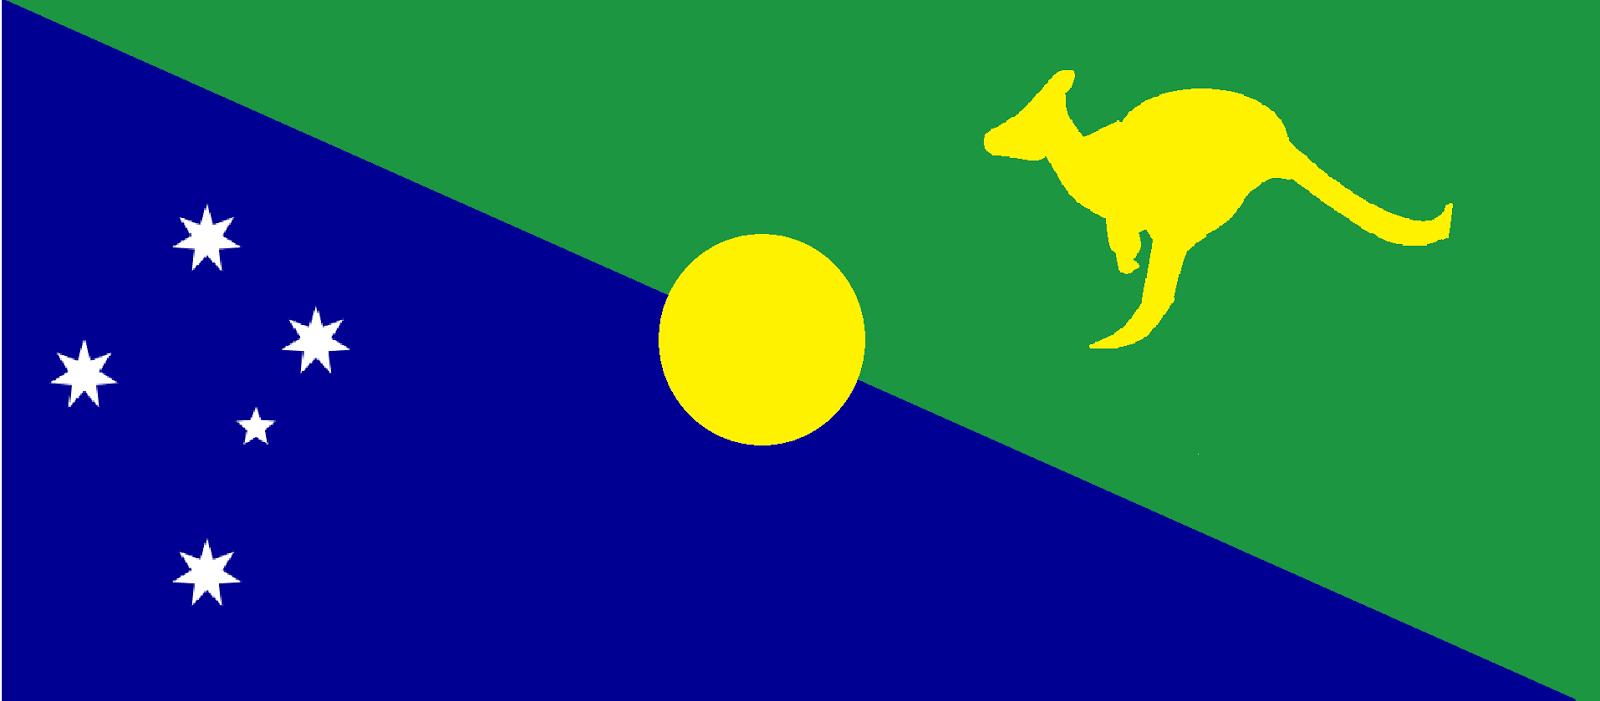 A new flag for Australia?: Inspiring from the Christmas Island flag?